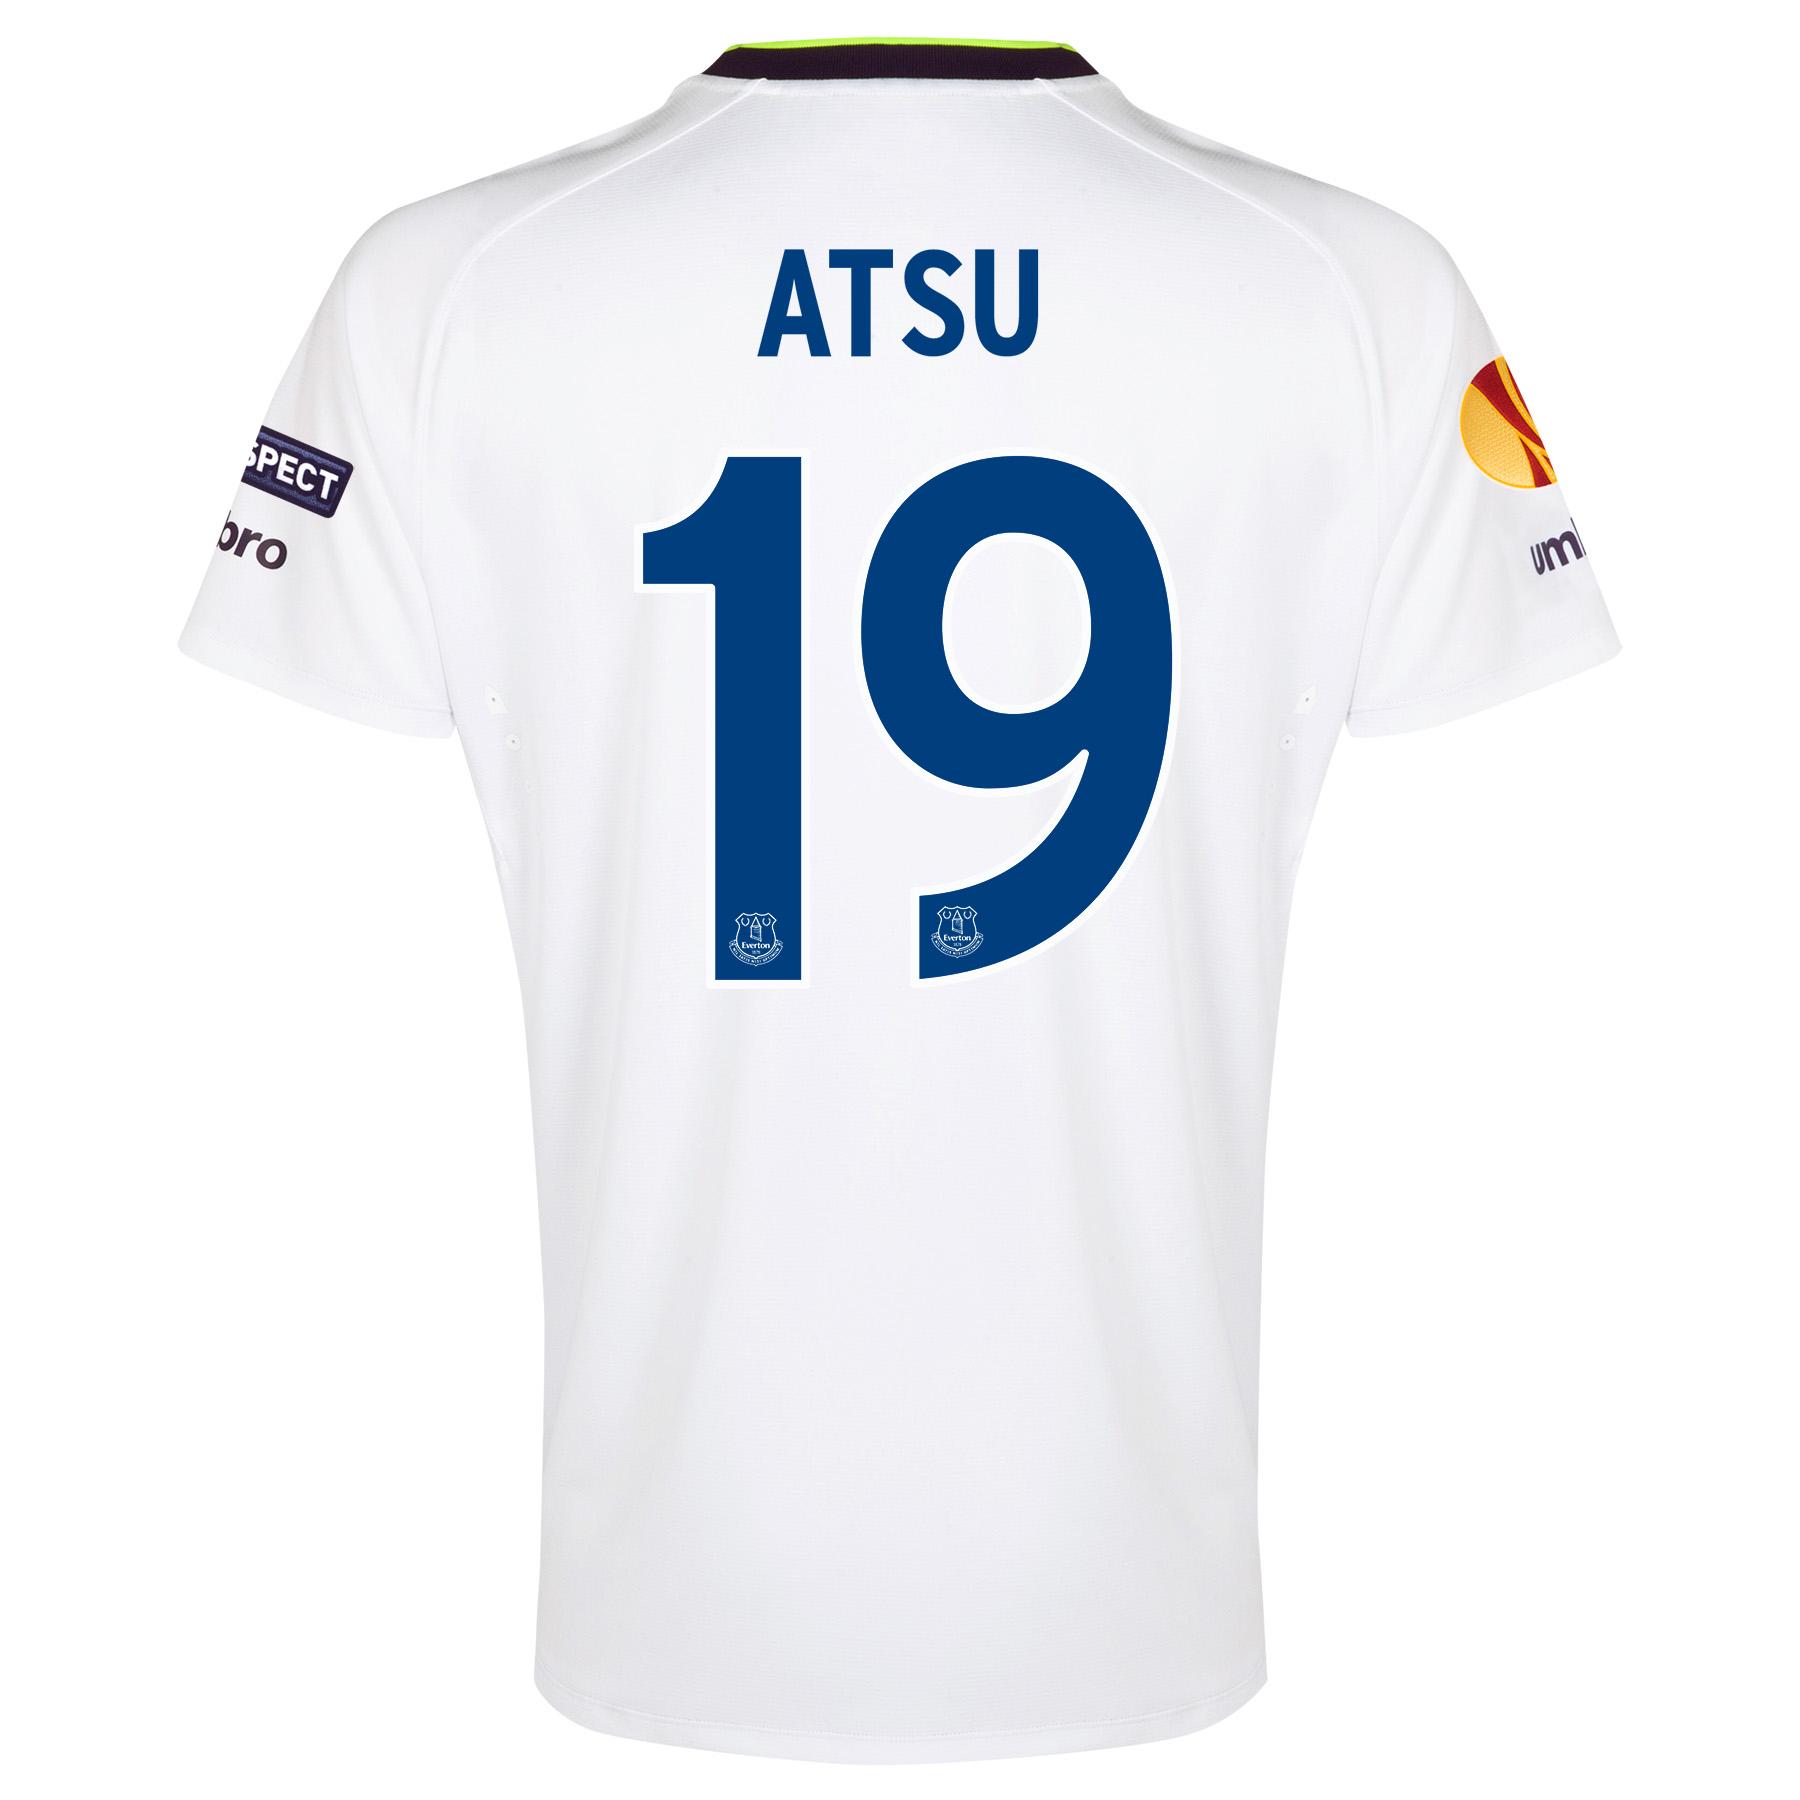 Everton UEFA Europa League 3rd Shirt 2014/15 with Atsu 19 printing